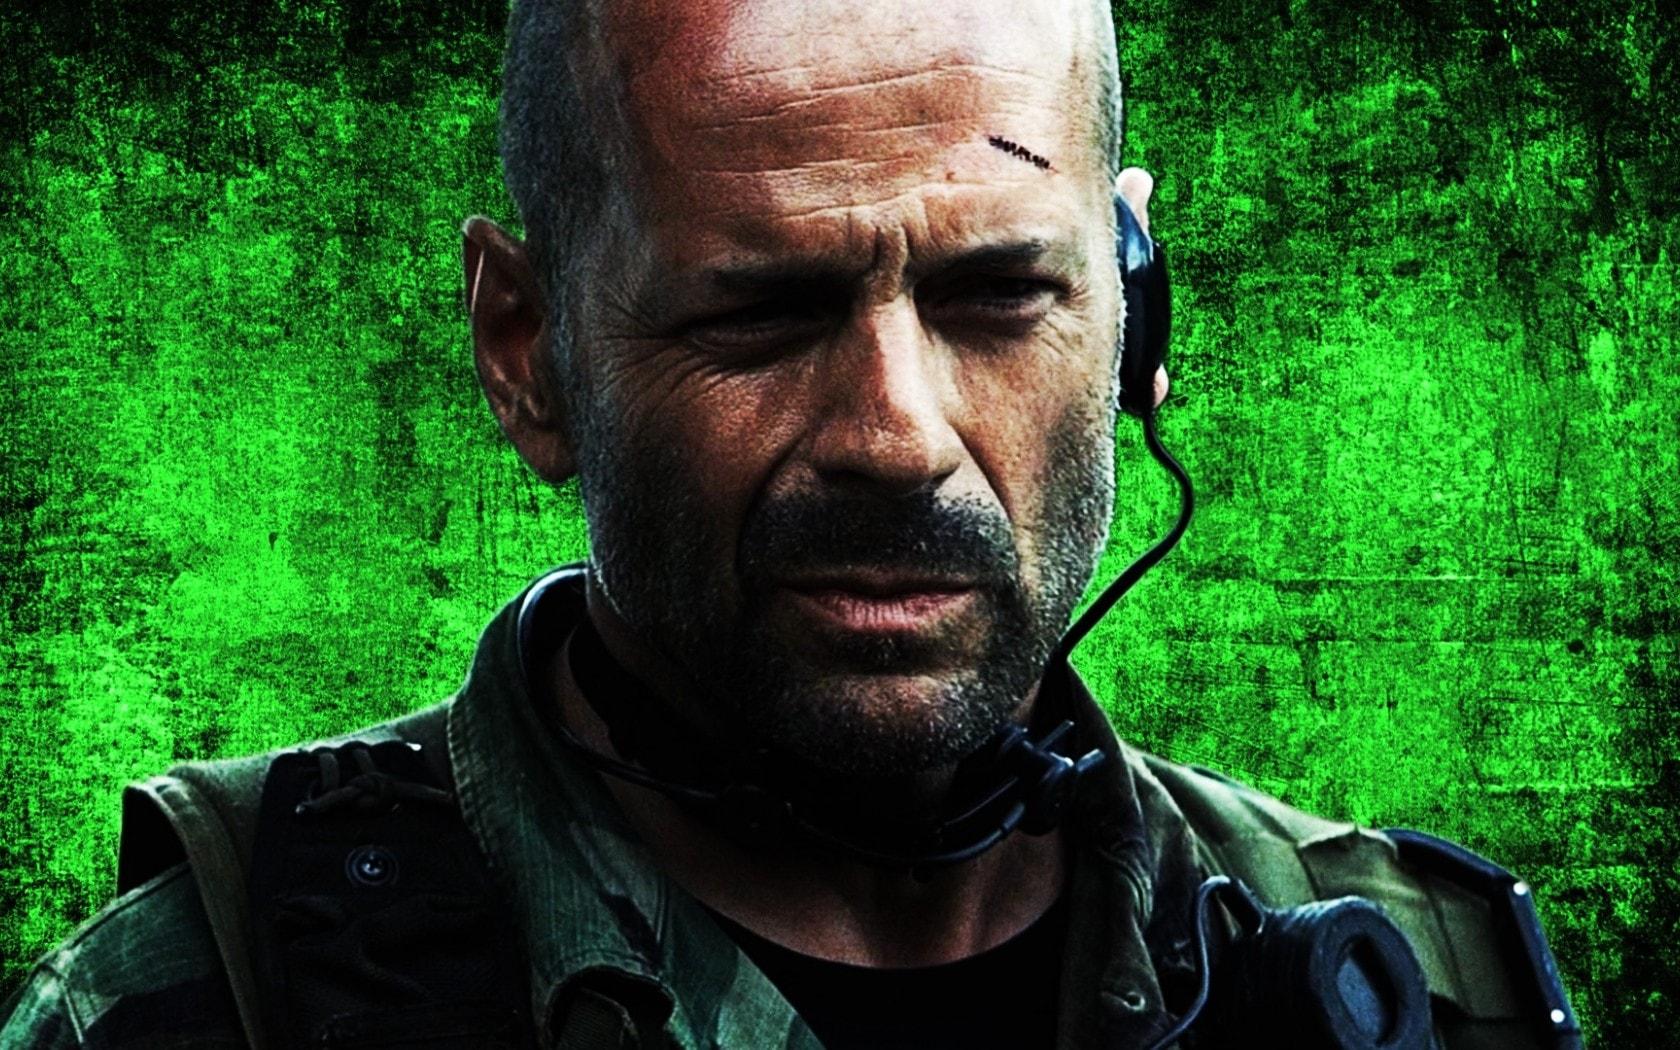 Bruce Willis for mobile